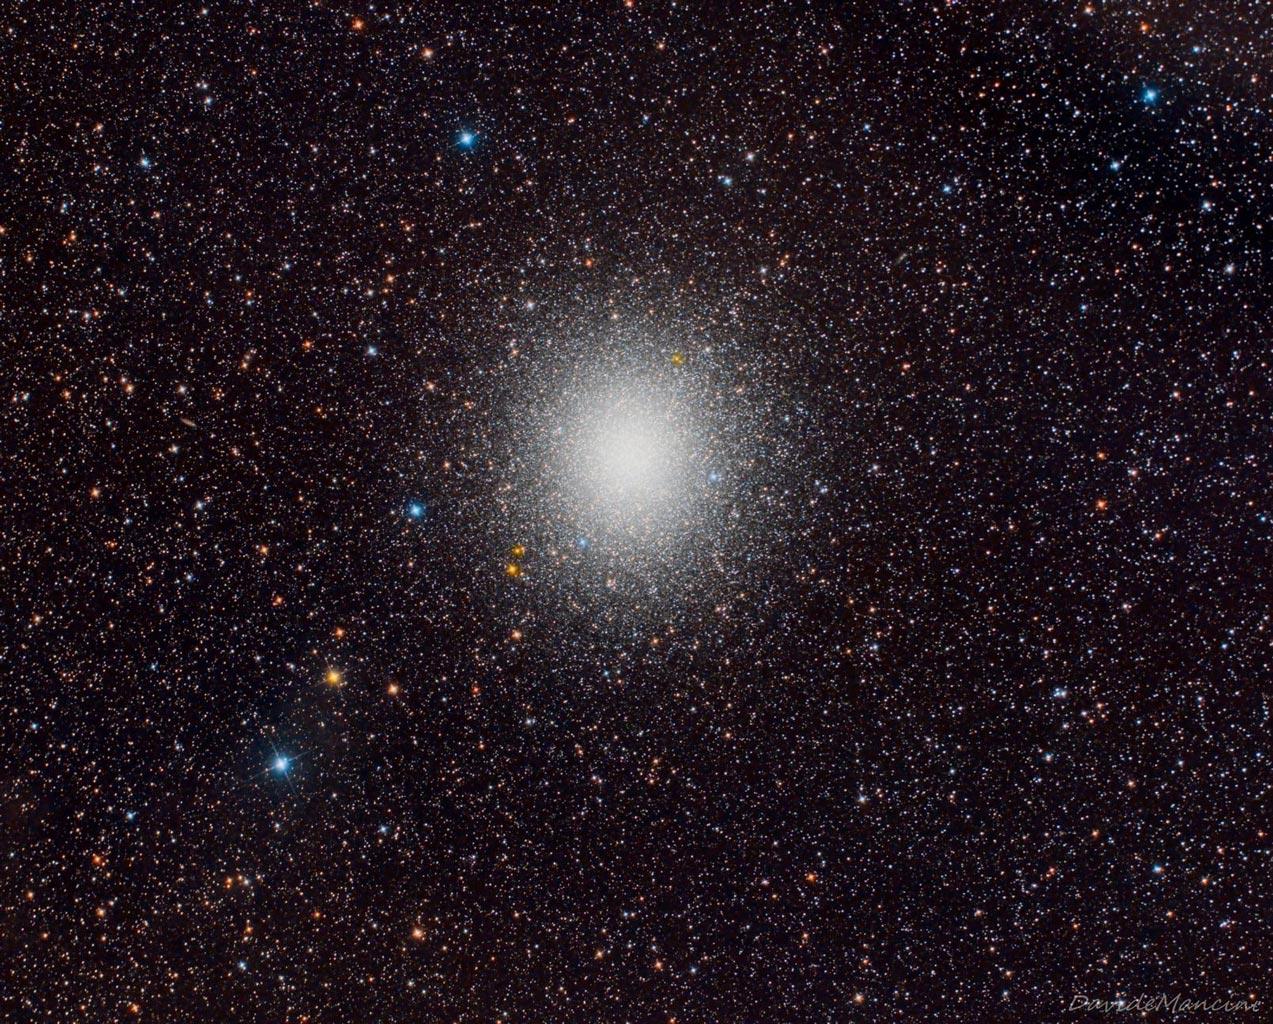 Omega Centauri by Davide Mancini Sharpstar 150 HNT 2.8 ZWO ASI2600MC Pro Optolong L-Pro SkyWatcher HEQ5